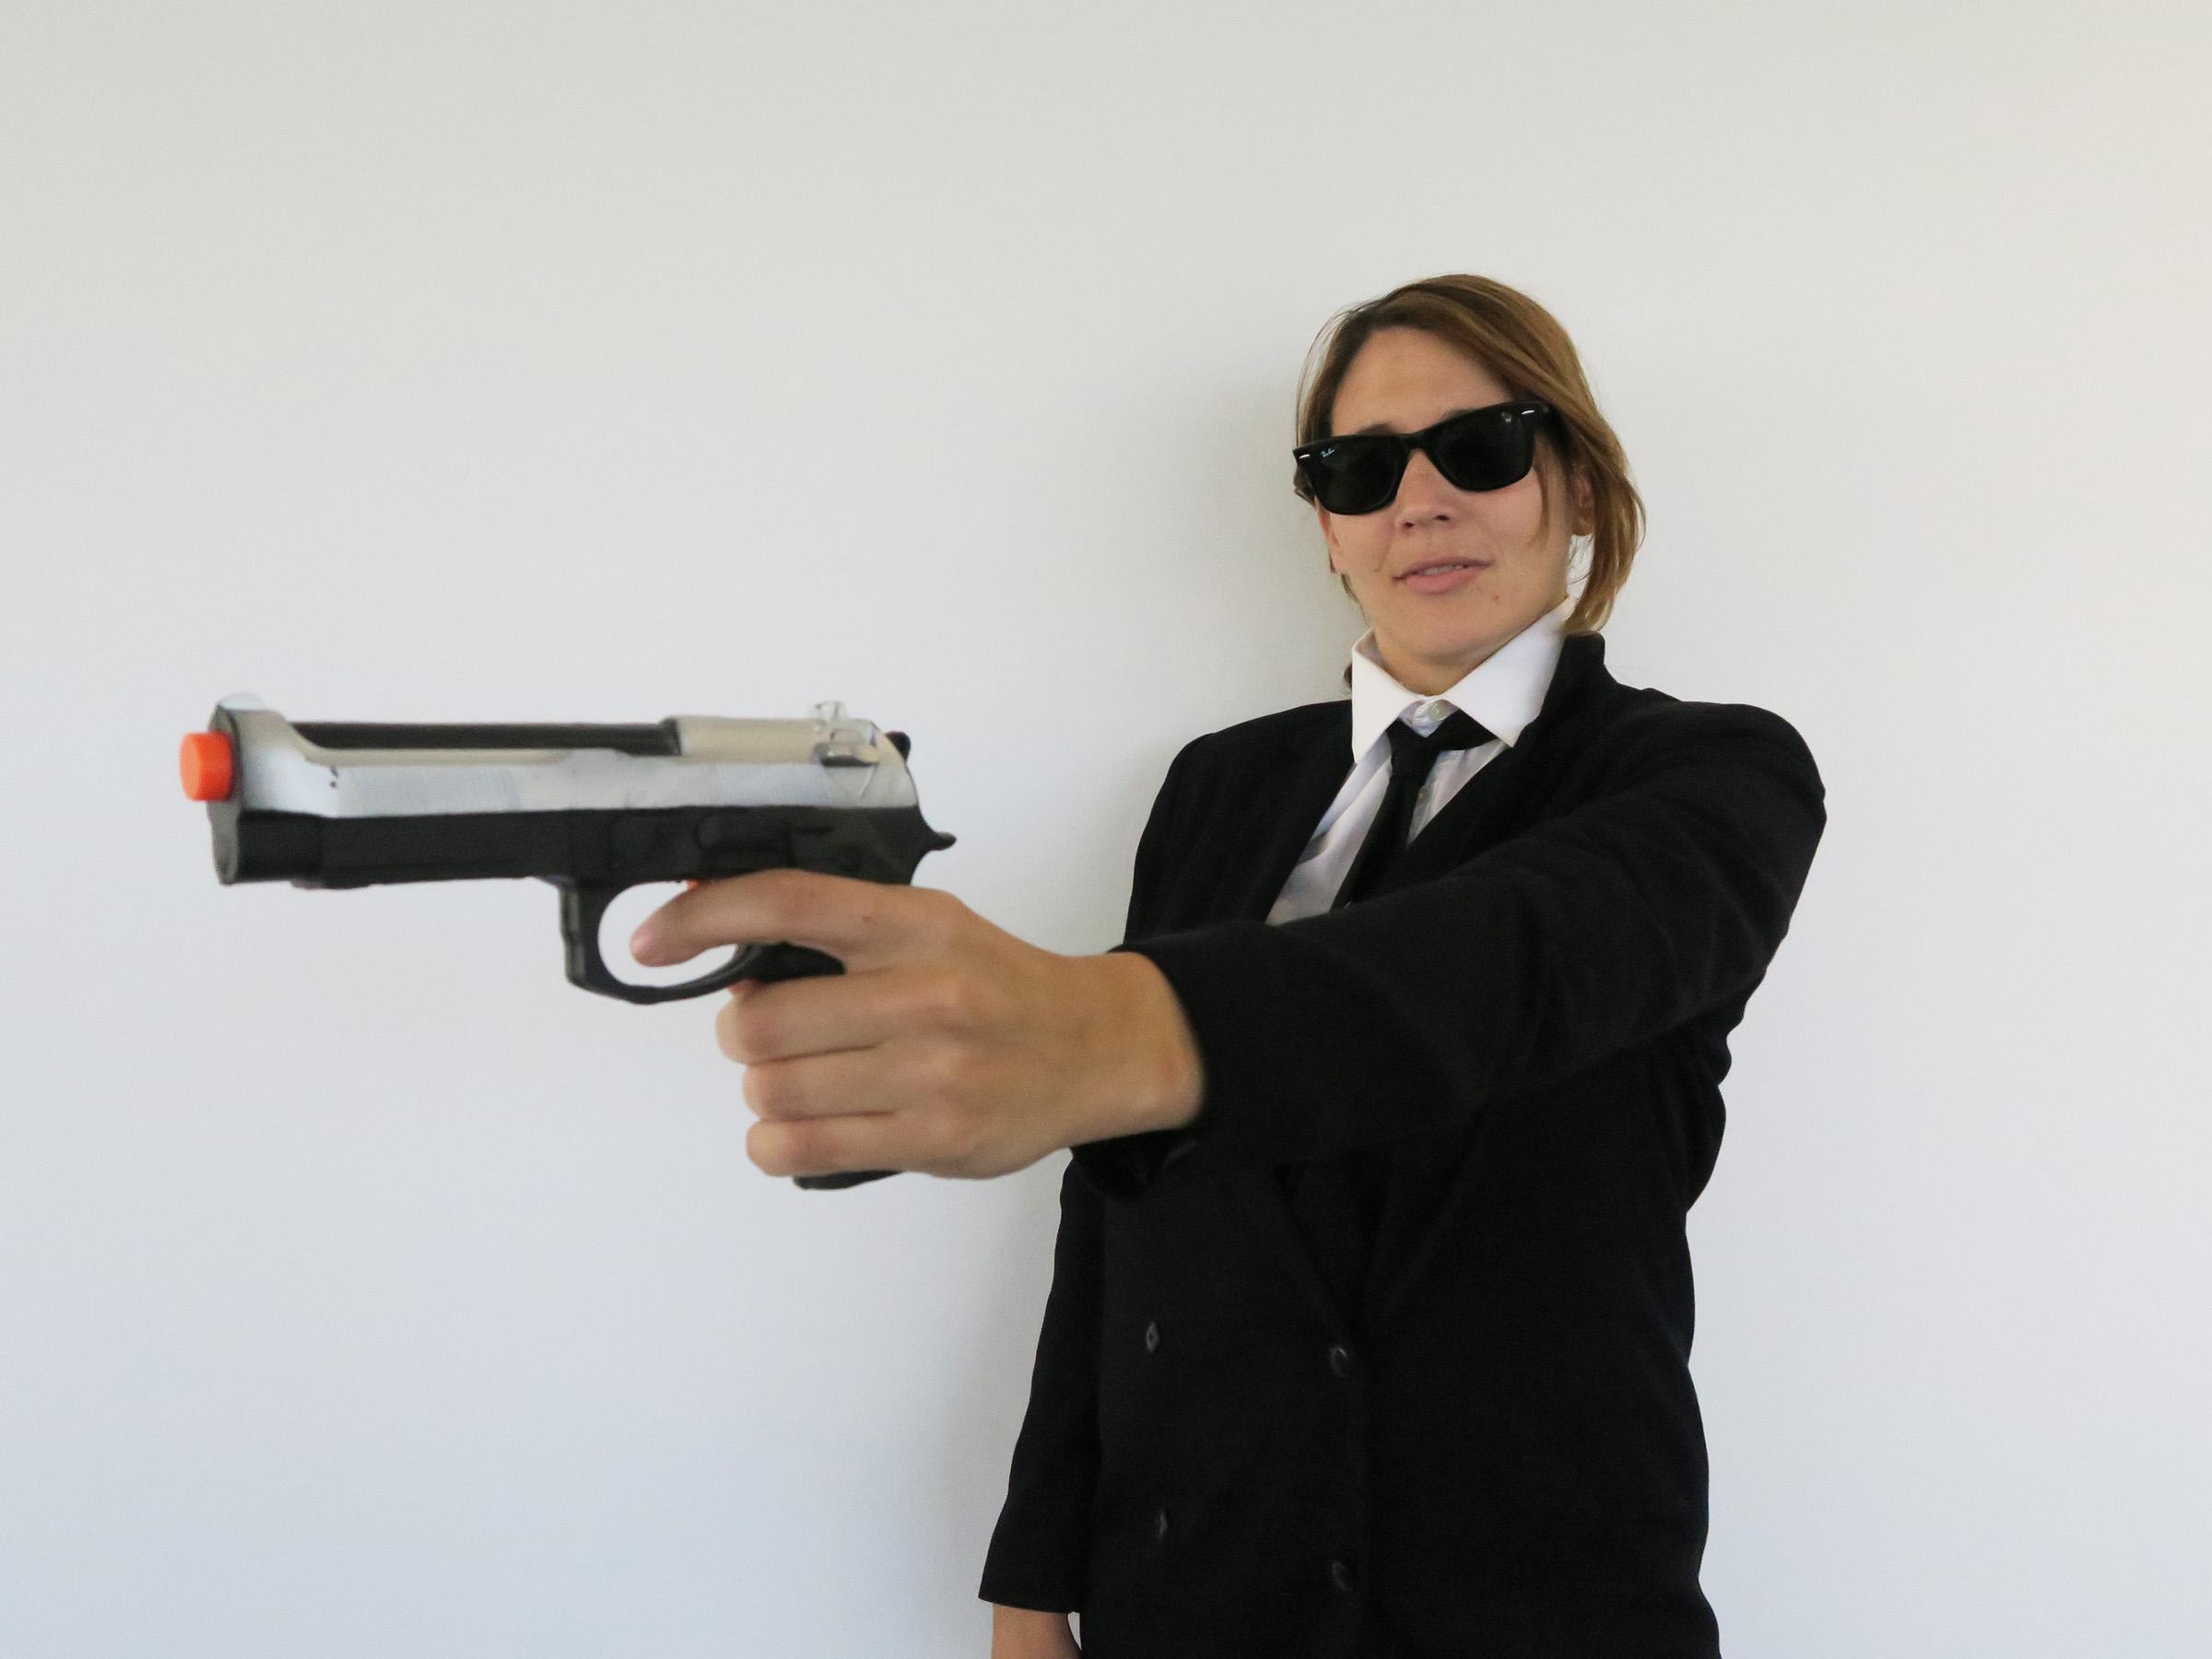 Vincent Vega - Experto en seguridad online